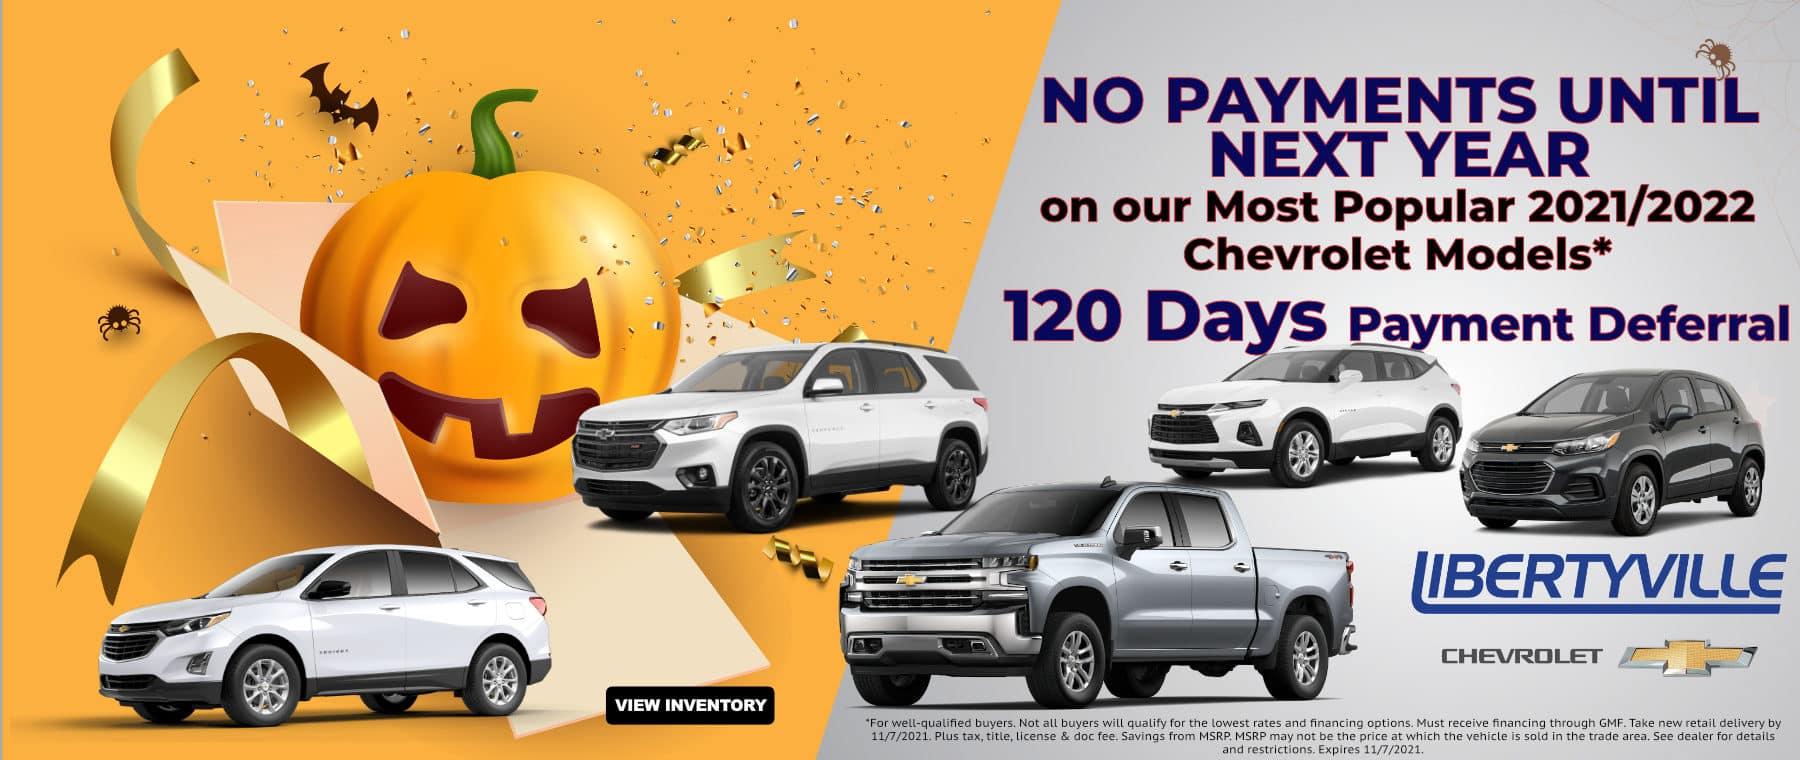 R_October_2021_General_1_Chevrolet